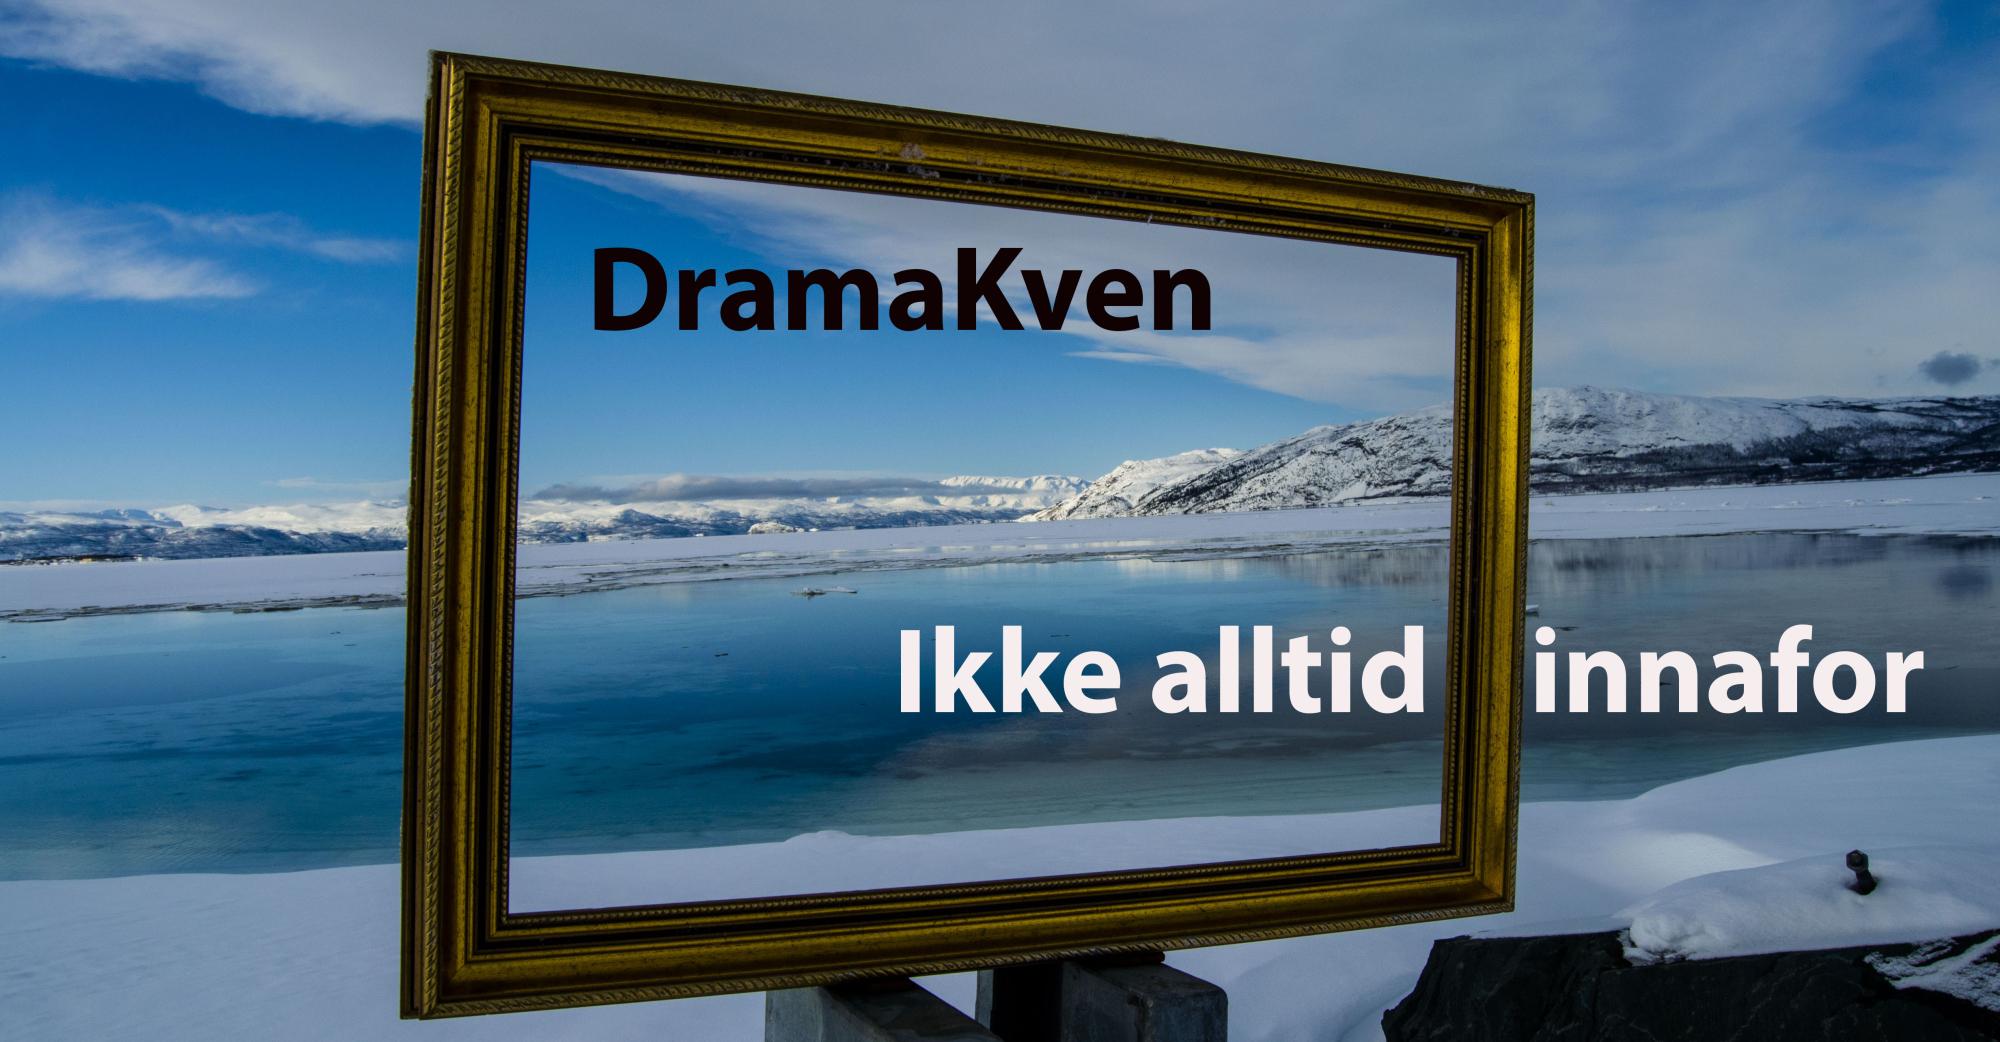 DramaKven